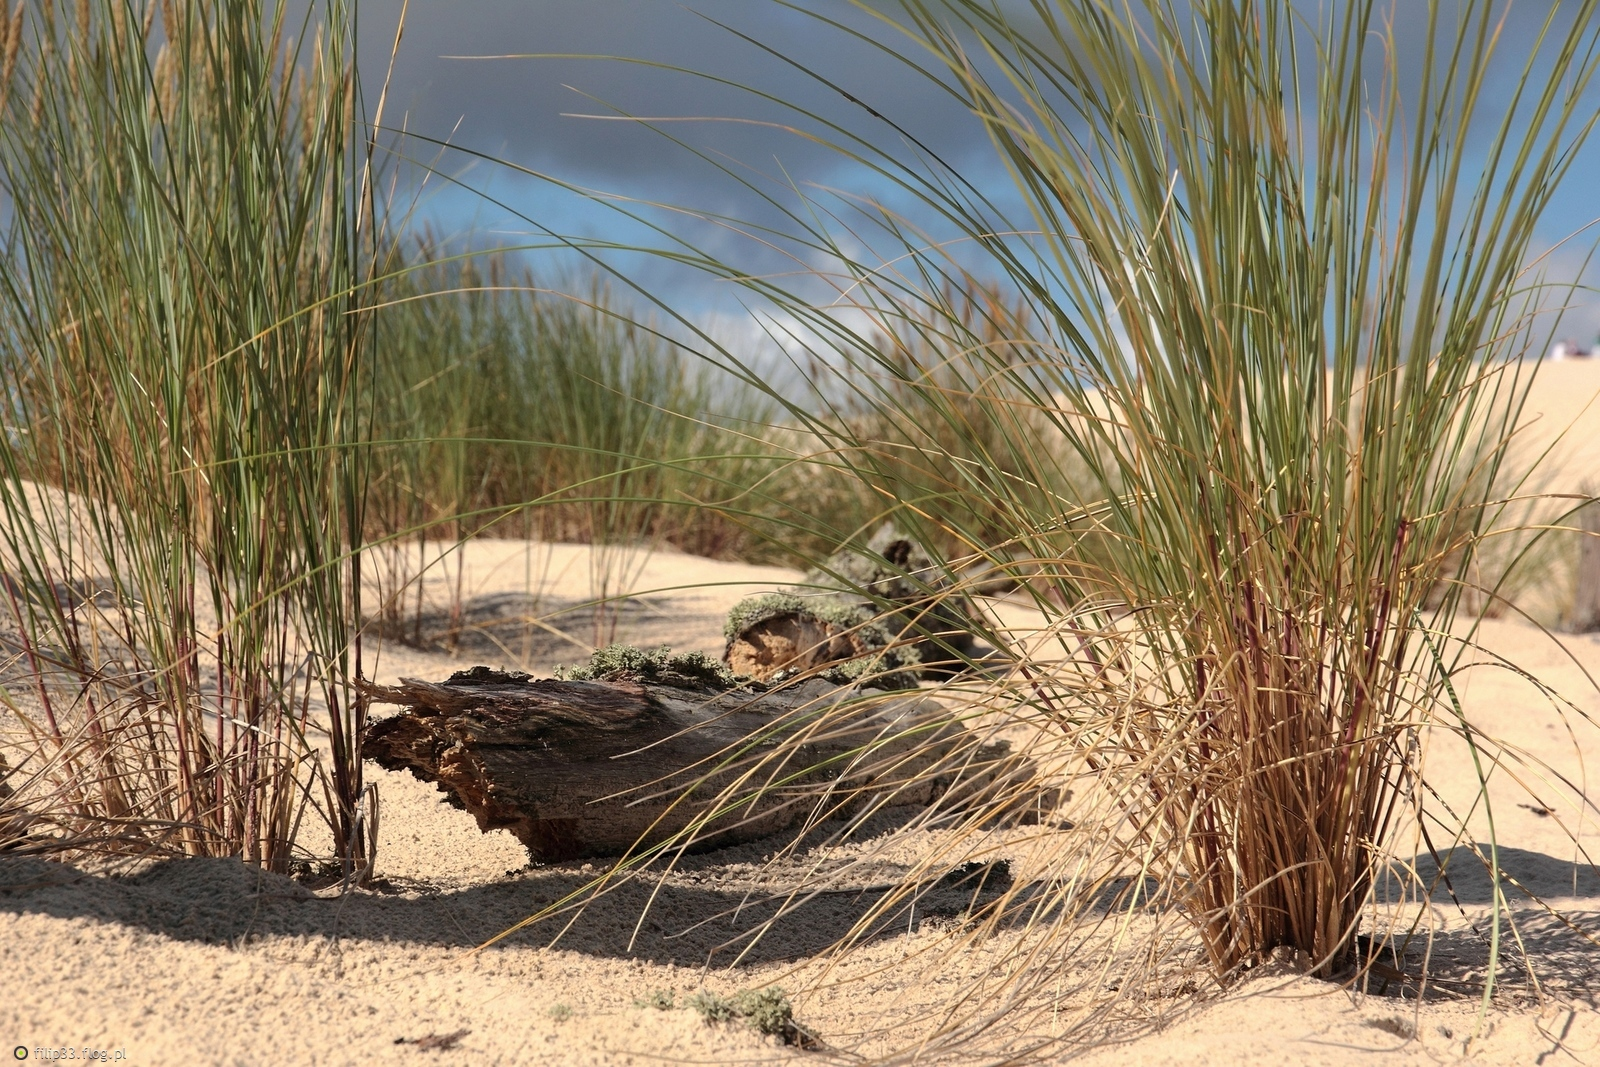 A na piasku trawy rosną ...